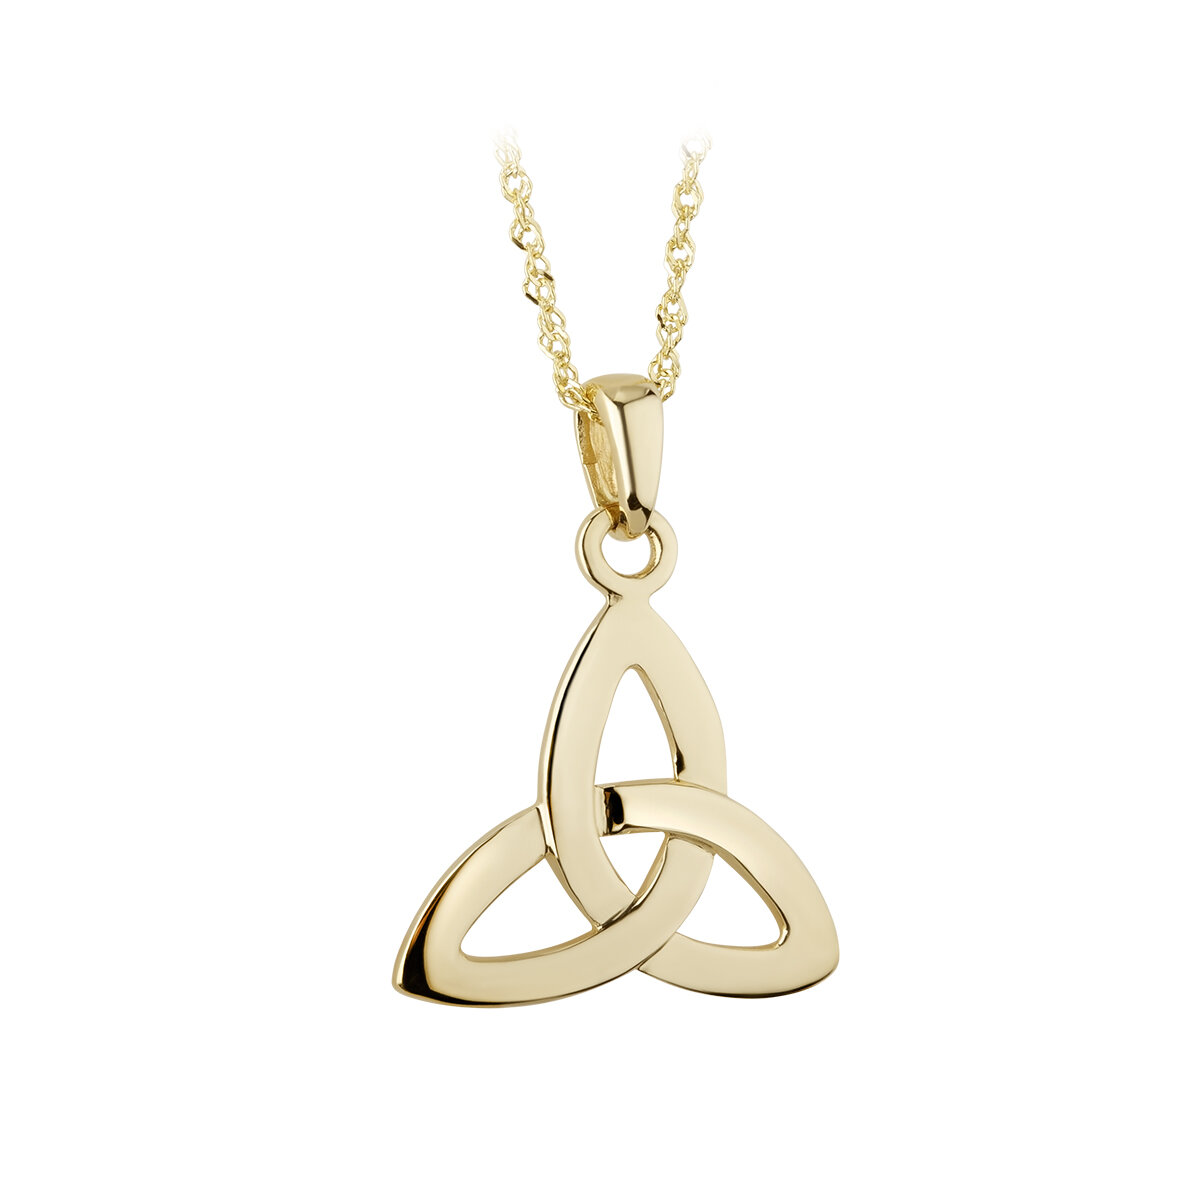 14k gold trinity knot pendant s4215 from Solvar